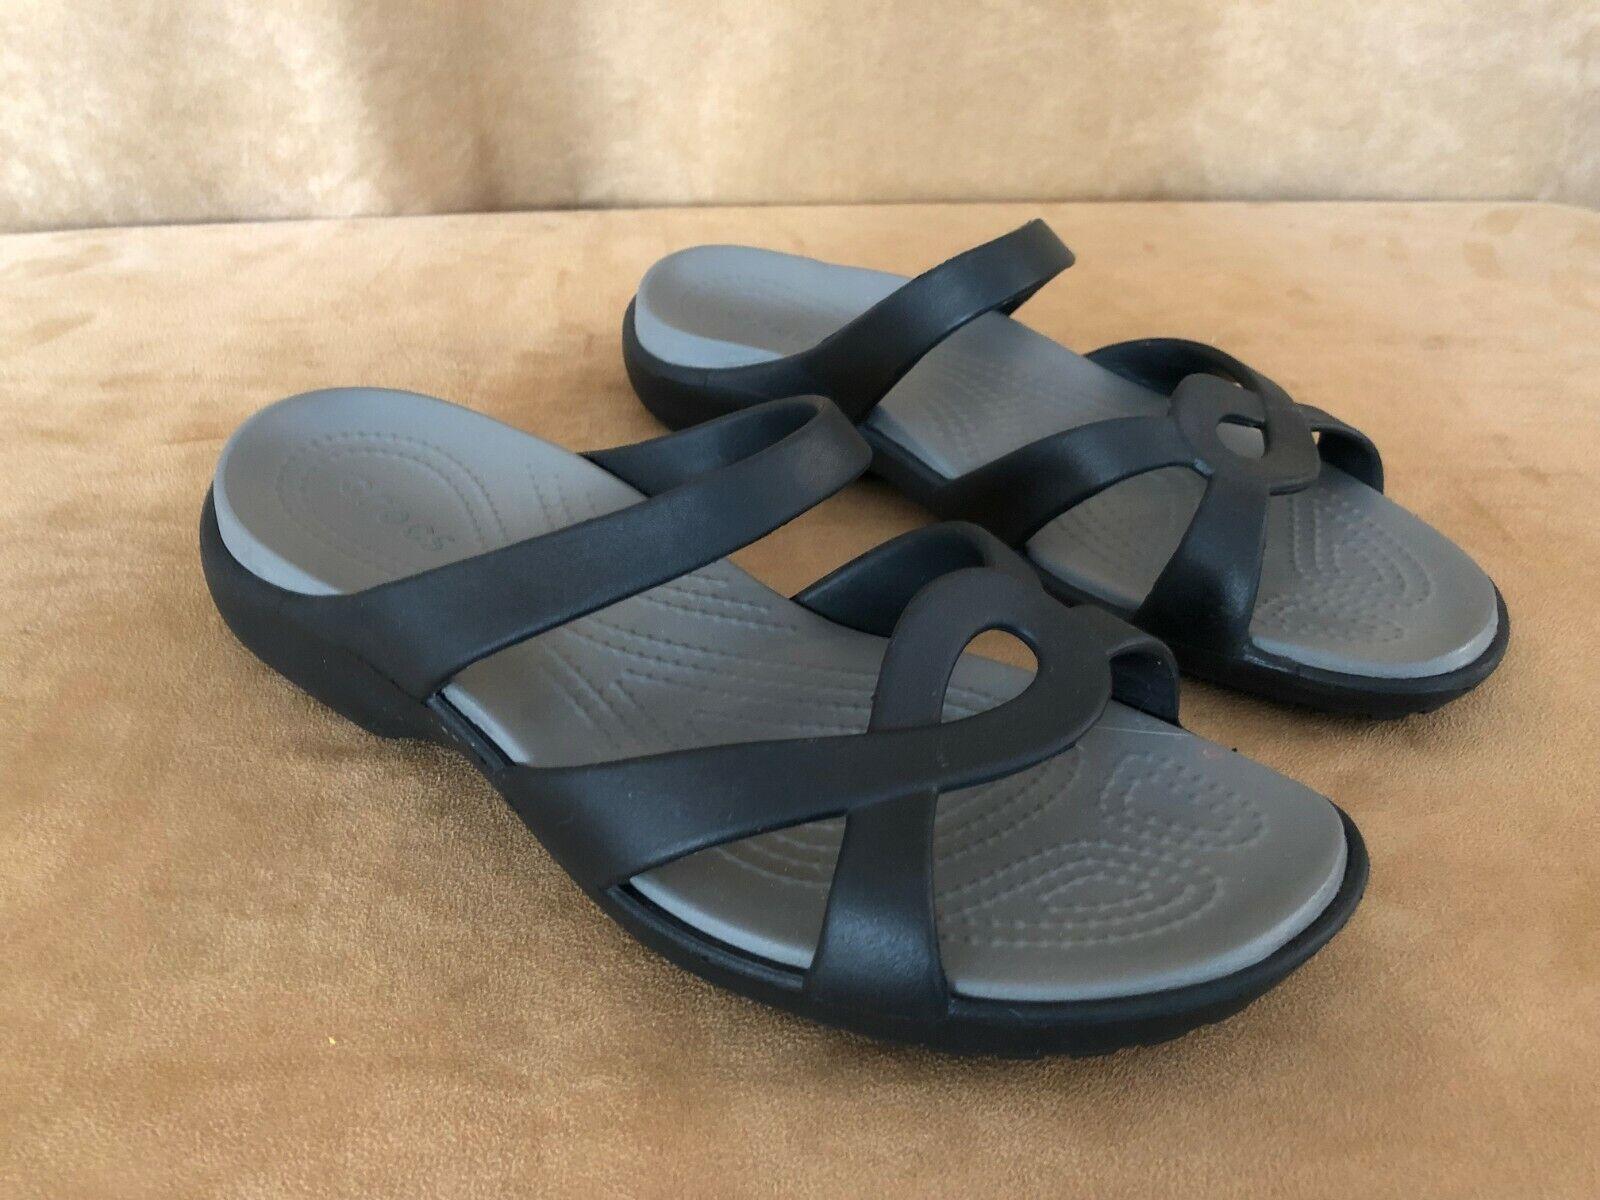 10 womens Authentic Crocs shoes flat sandals slip on black